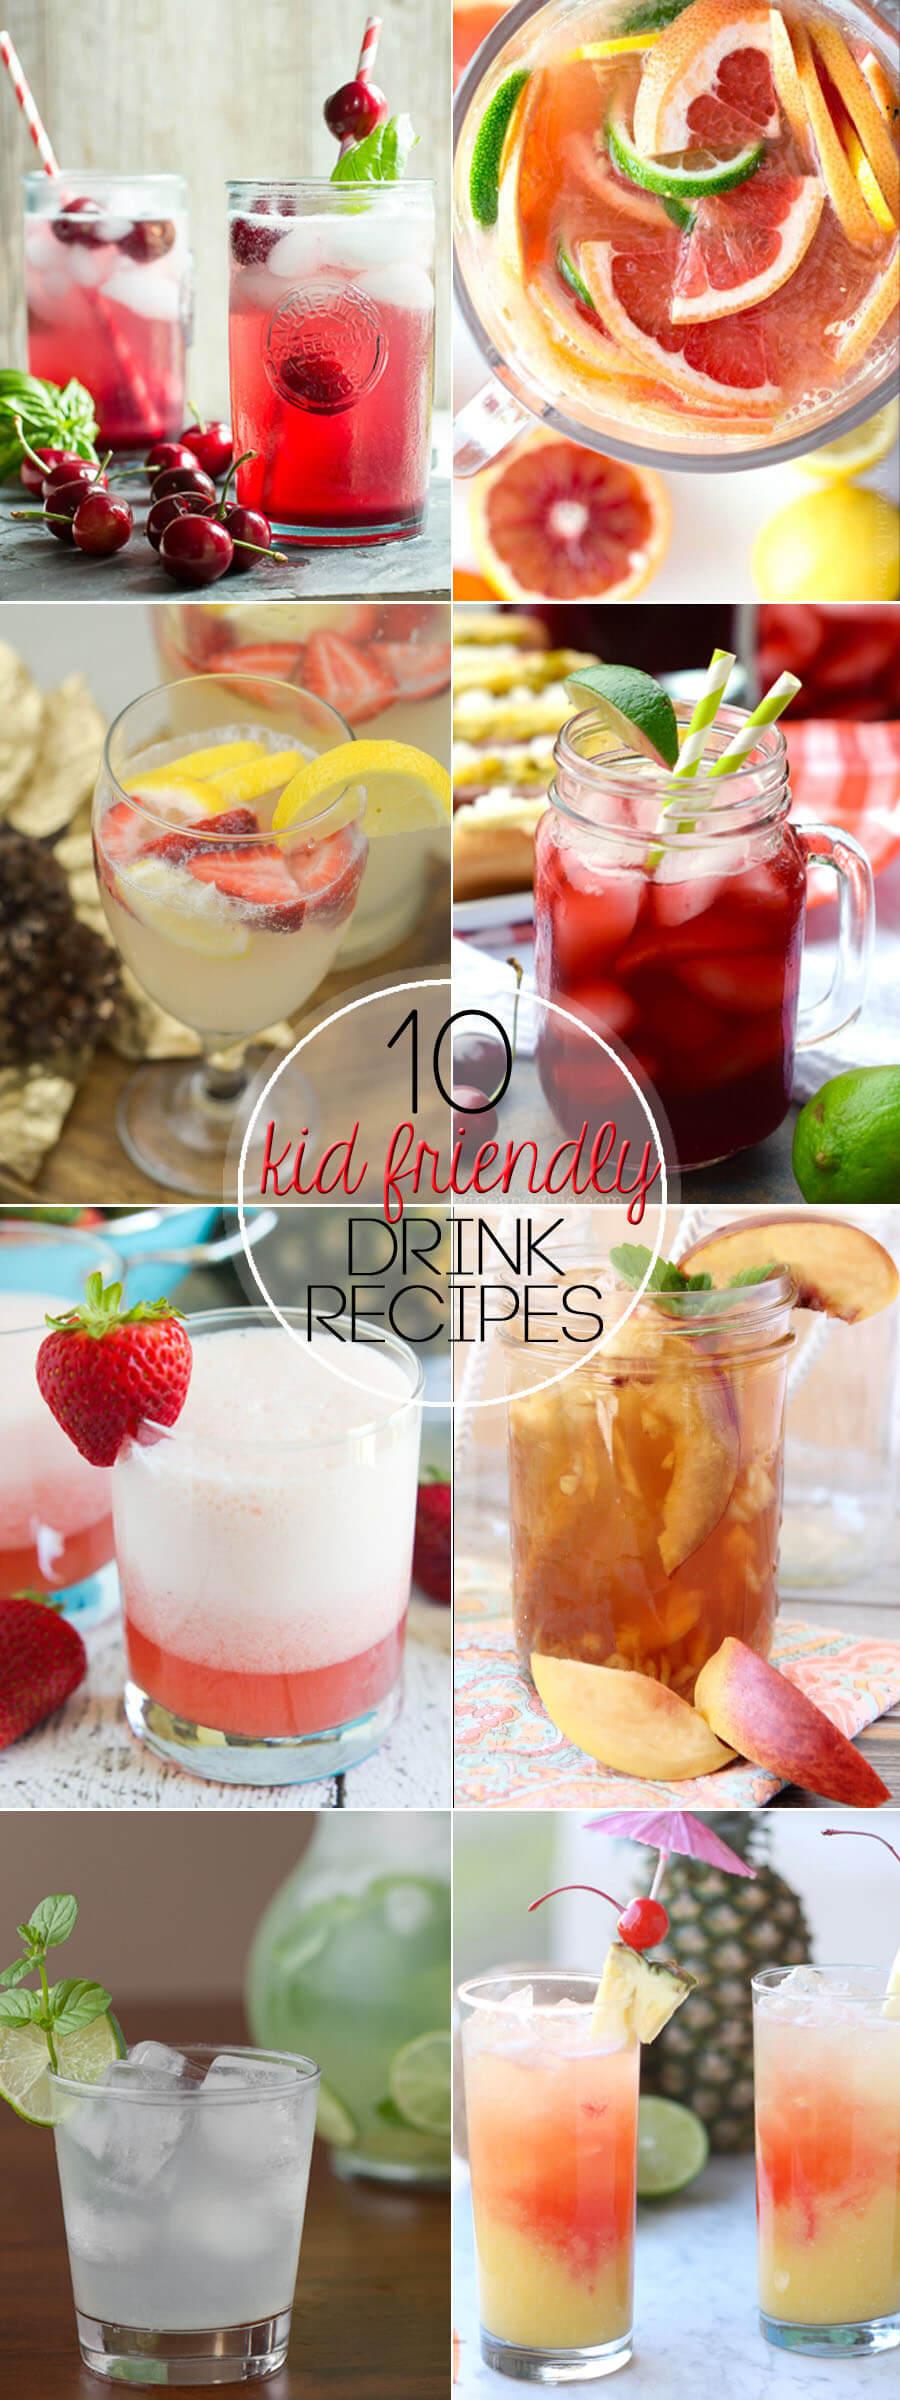 10 Kid-Friendly Summer Drink Recipes